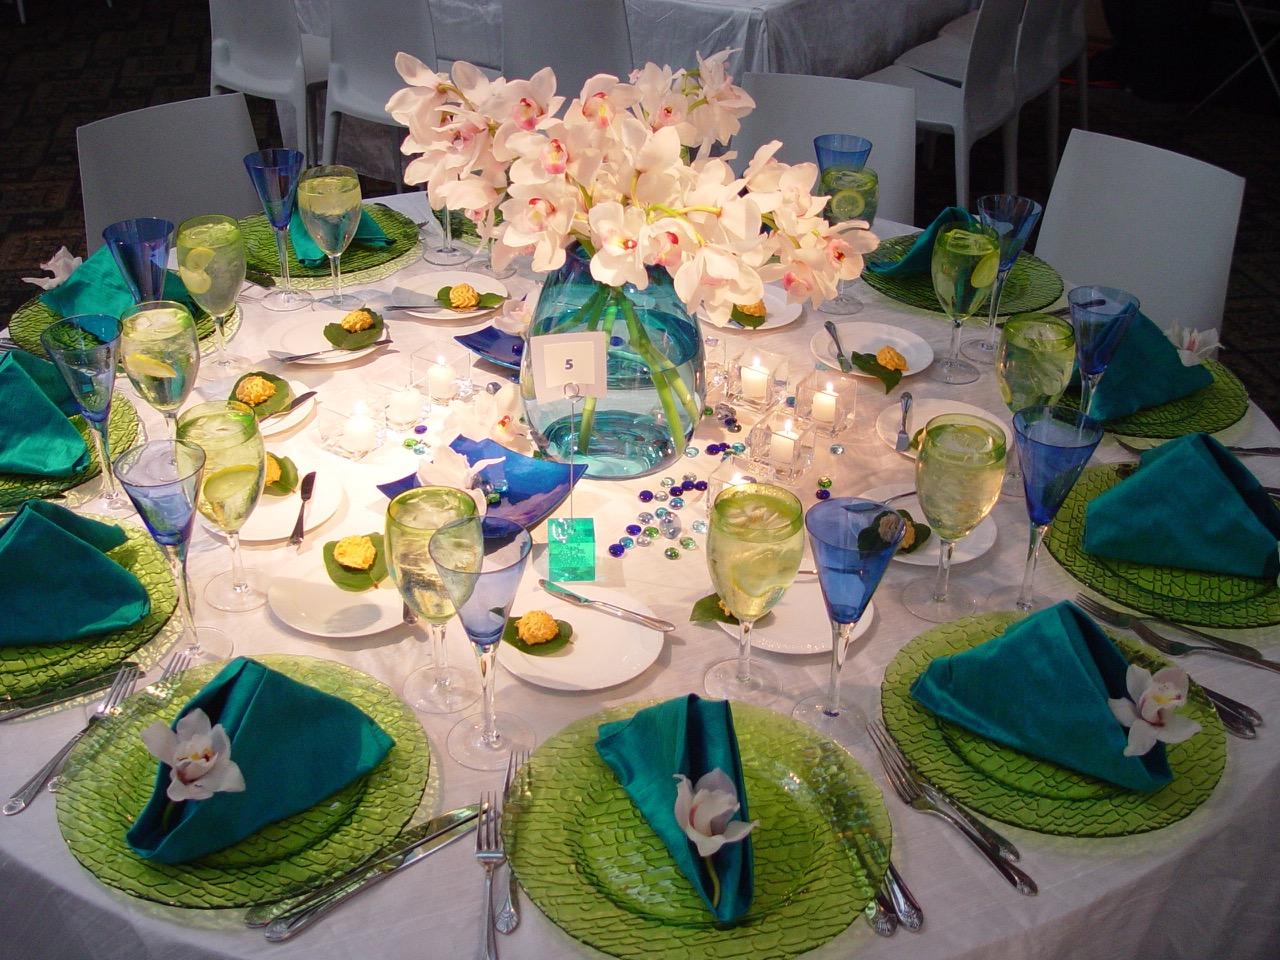 Event+Decor+Design+Lighting+NJ+NYC+Eggsotic+Events+NJs+Best+Event+Decorator+Event+Lighting+Event+Design+Wedding+Bar+Mitzvah+Bat+Mitzvah+Gala+Fundraiser+25.jpg